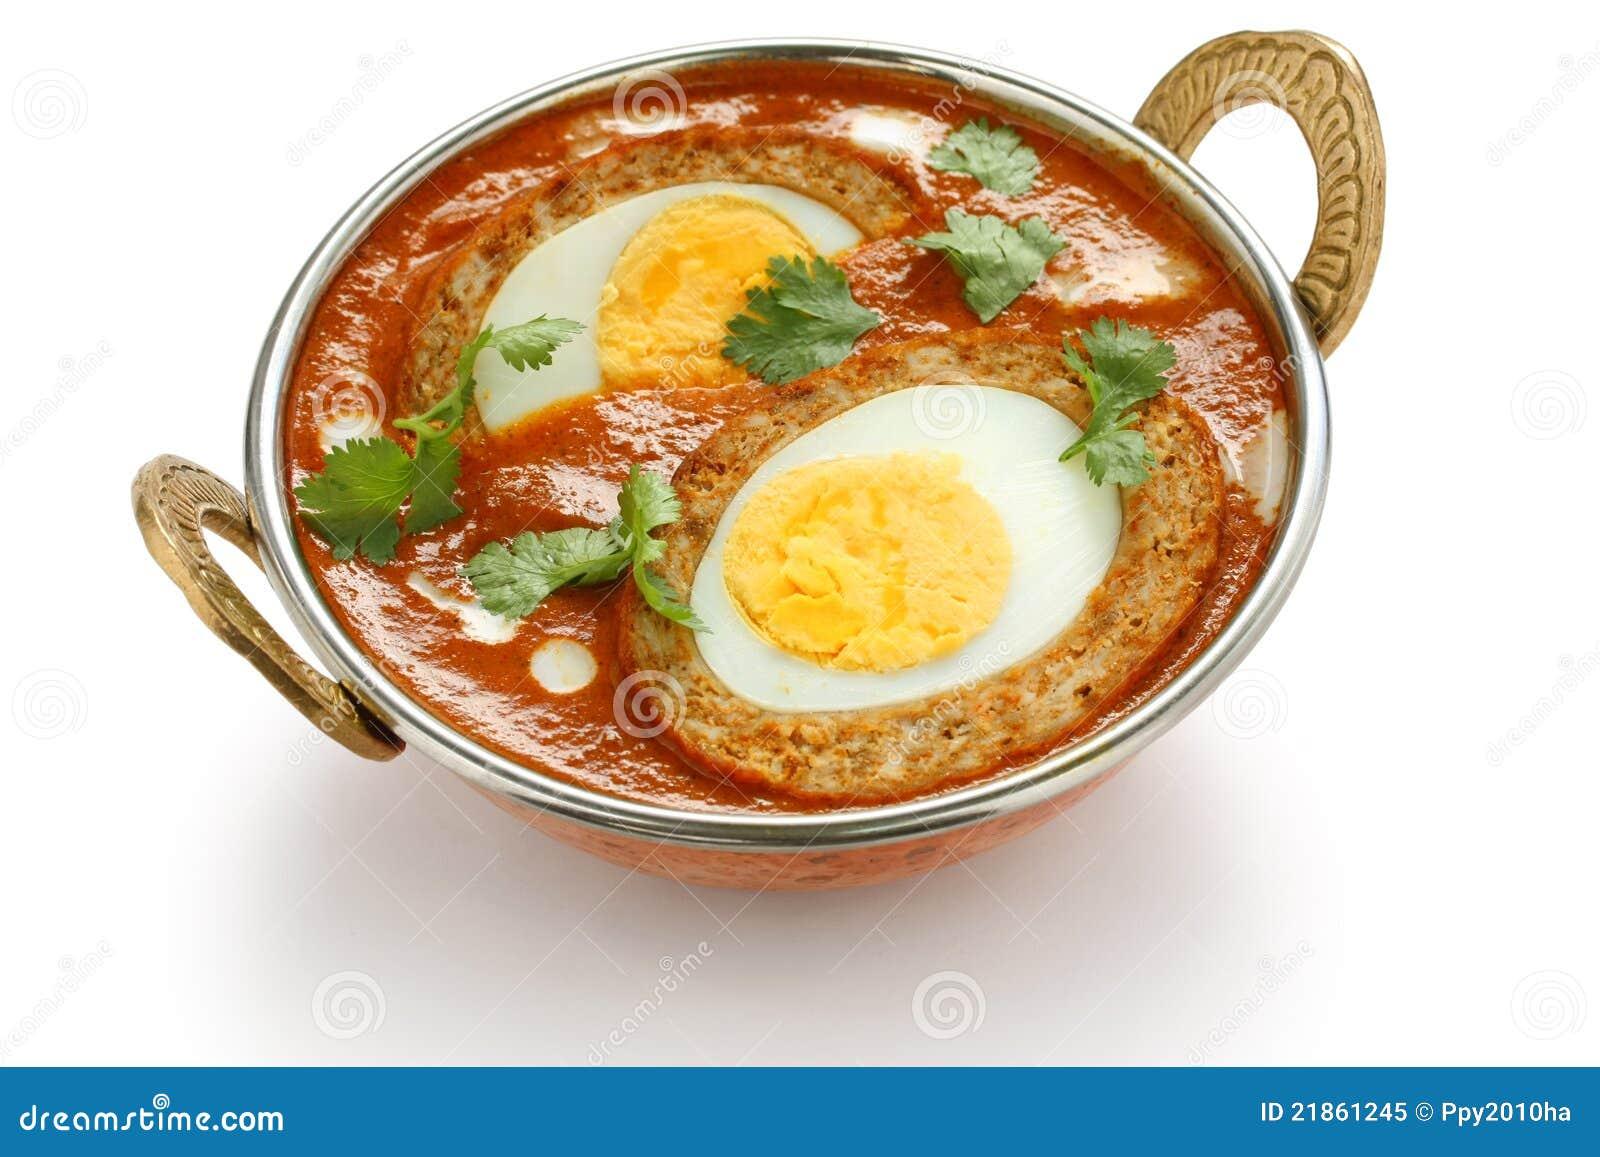 nargisi kofta curry indian cuisine stock image image 21861245. Black Bedroom Furniture Sets. Home Design Ideas